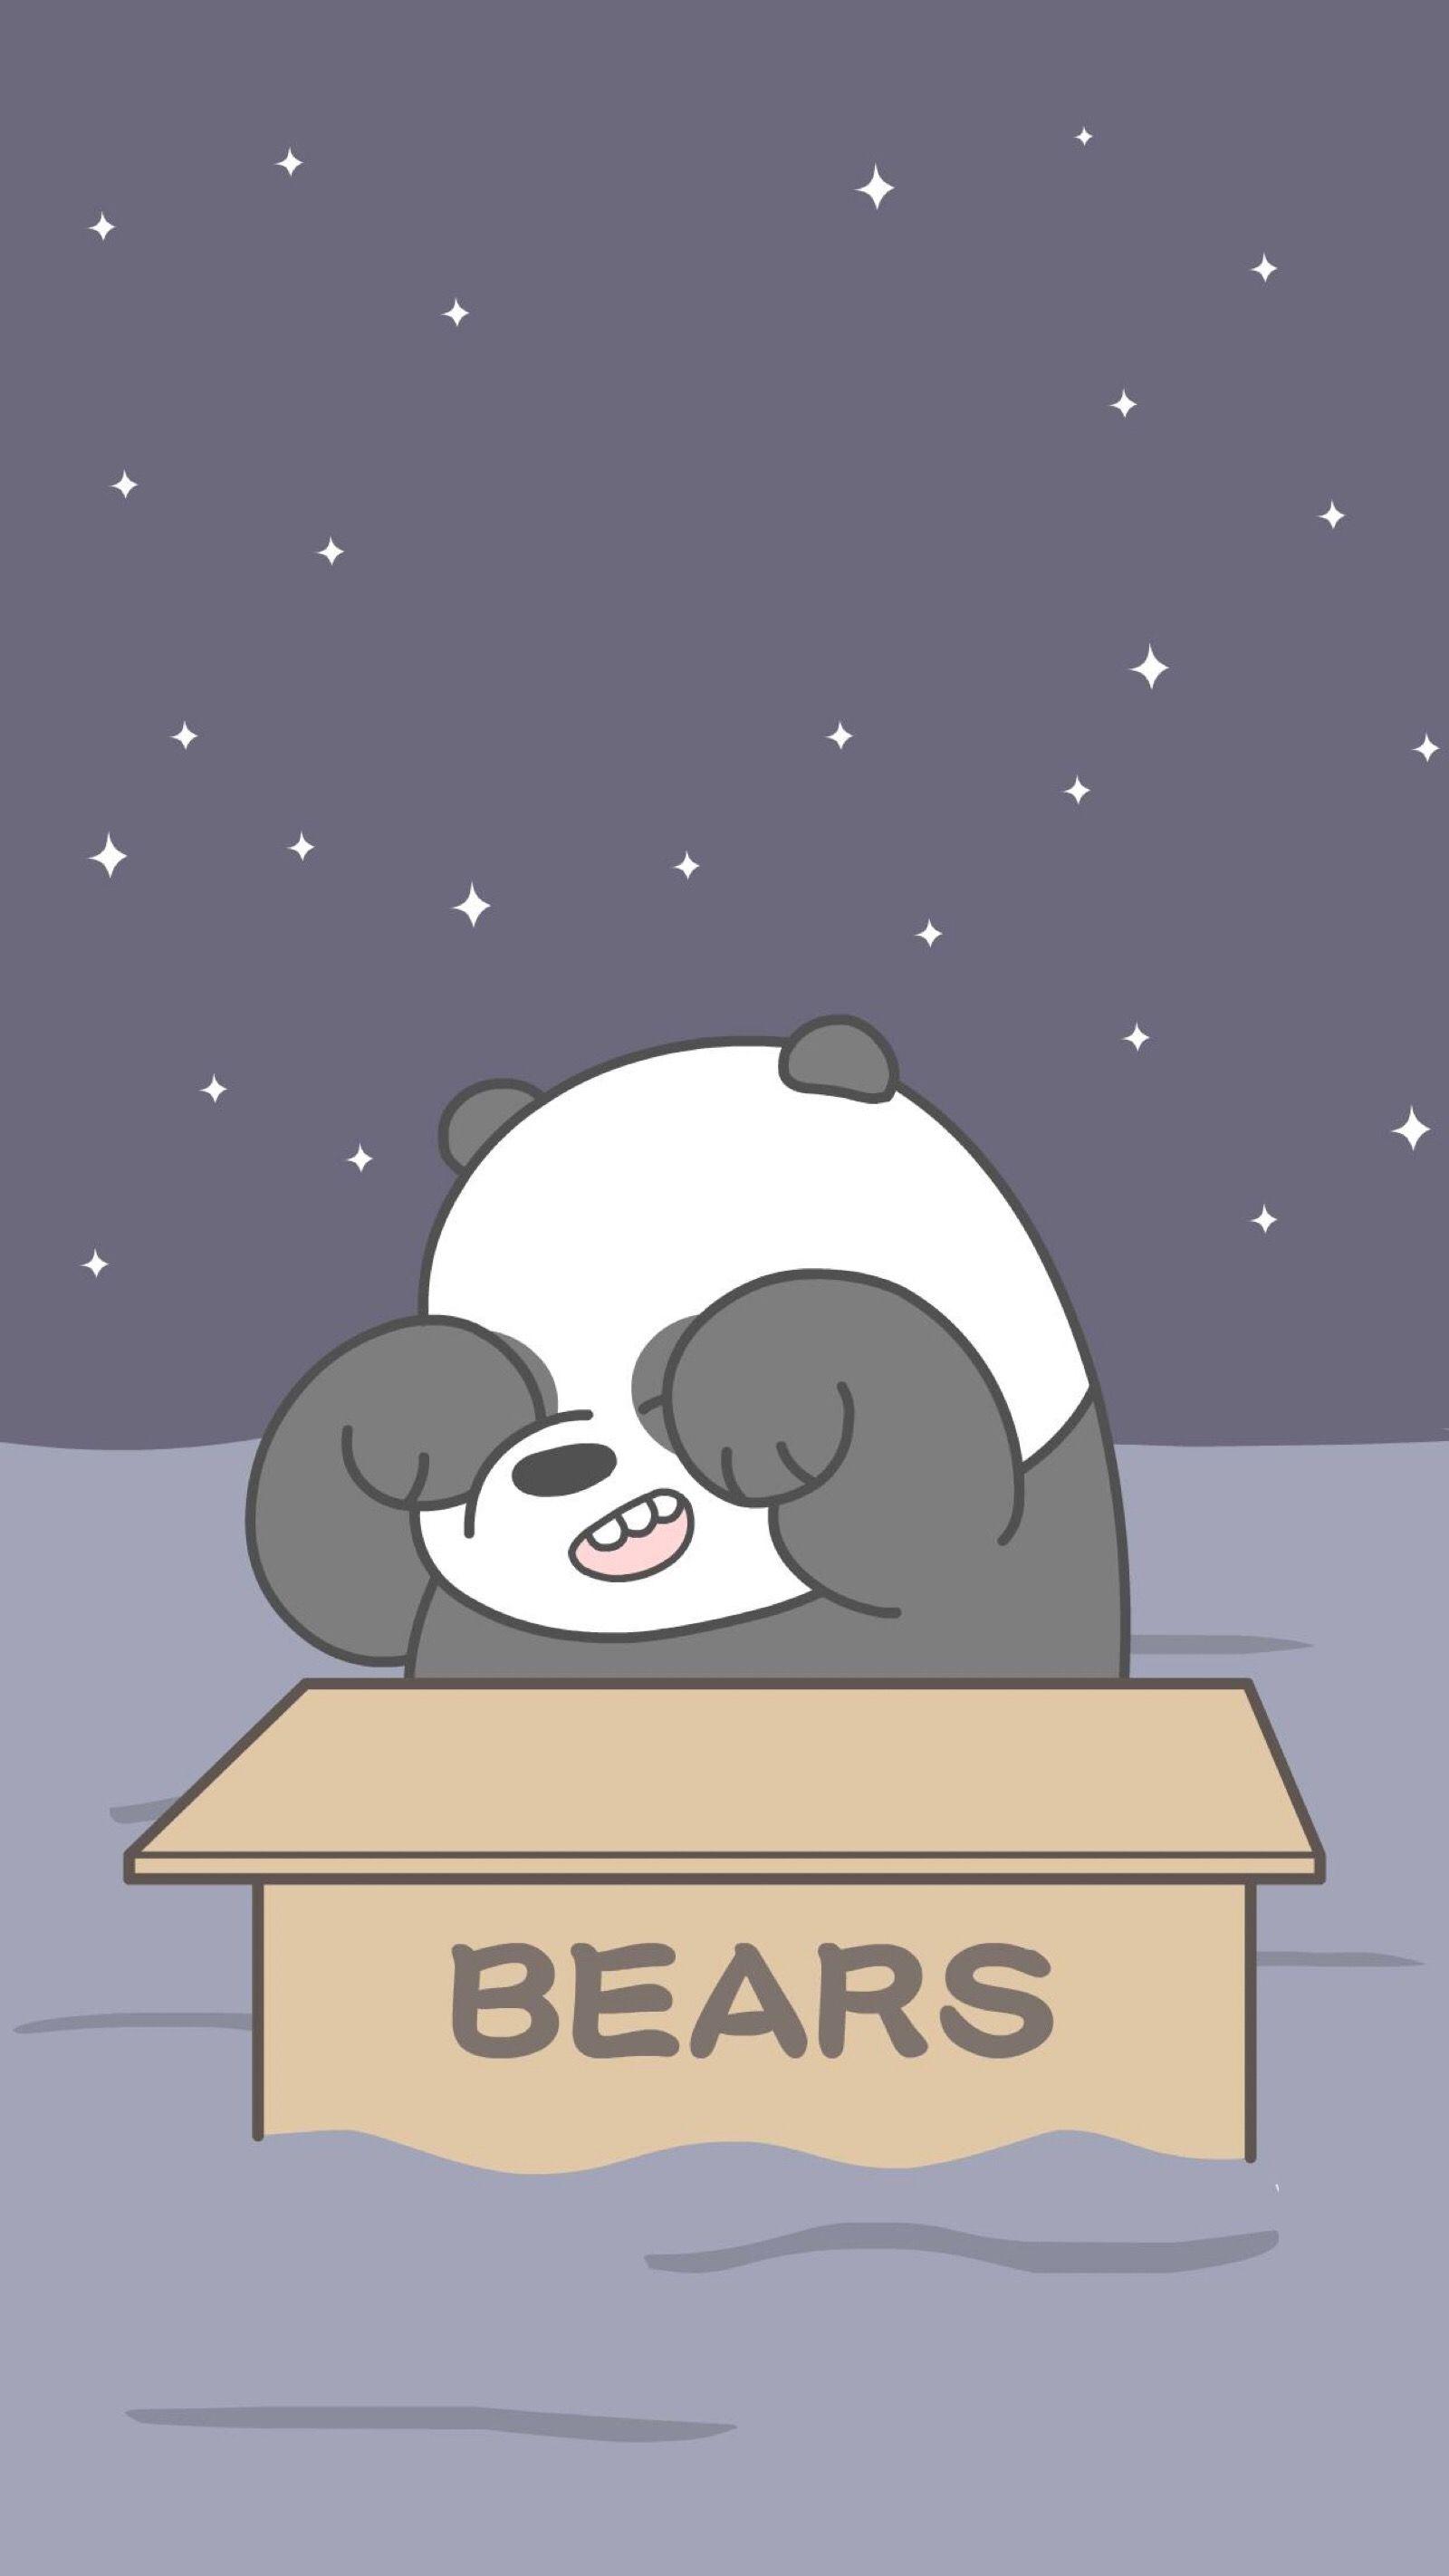 We Bare Bears Beruang Kutub Kartu Lucu Boneka Hewan